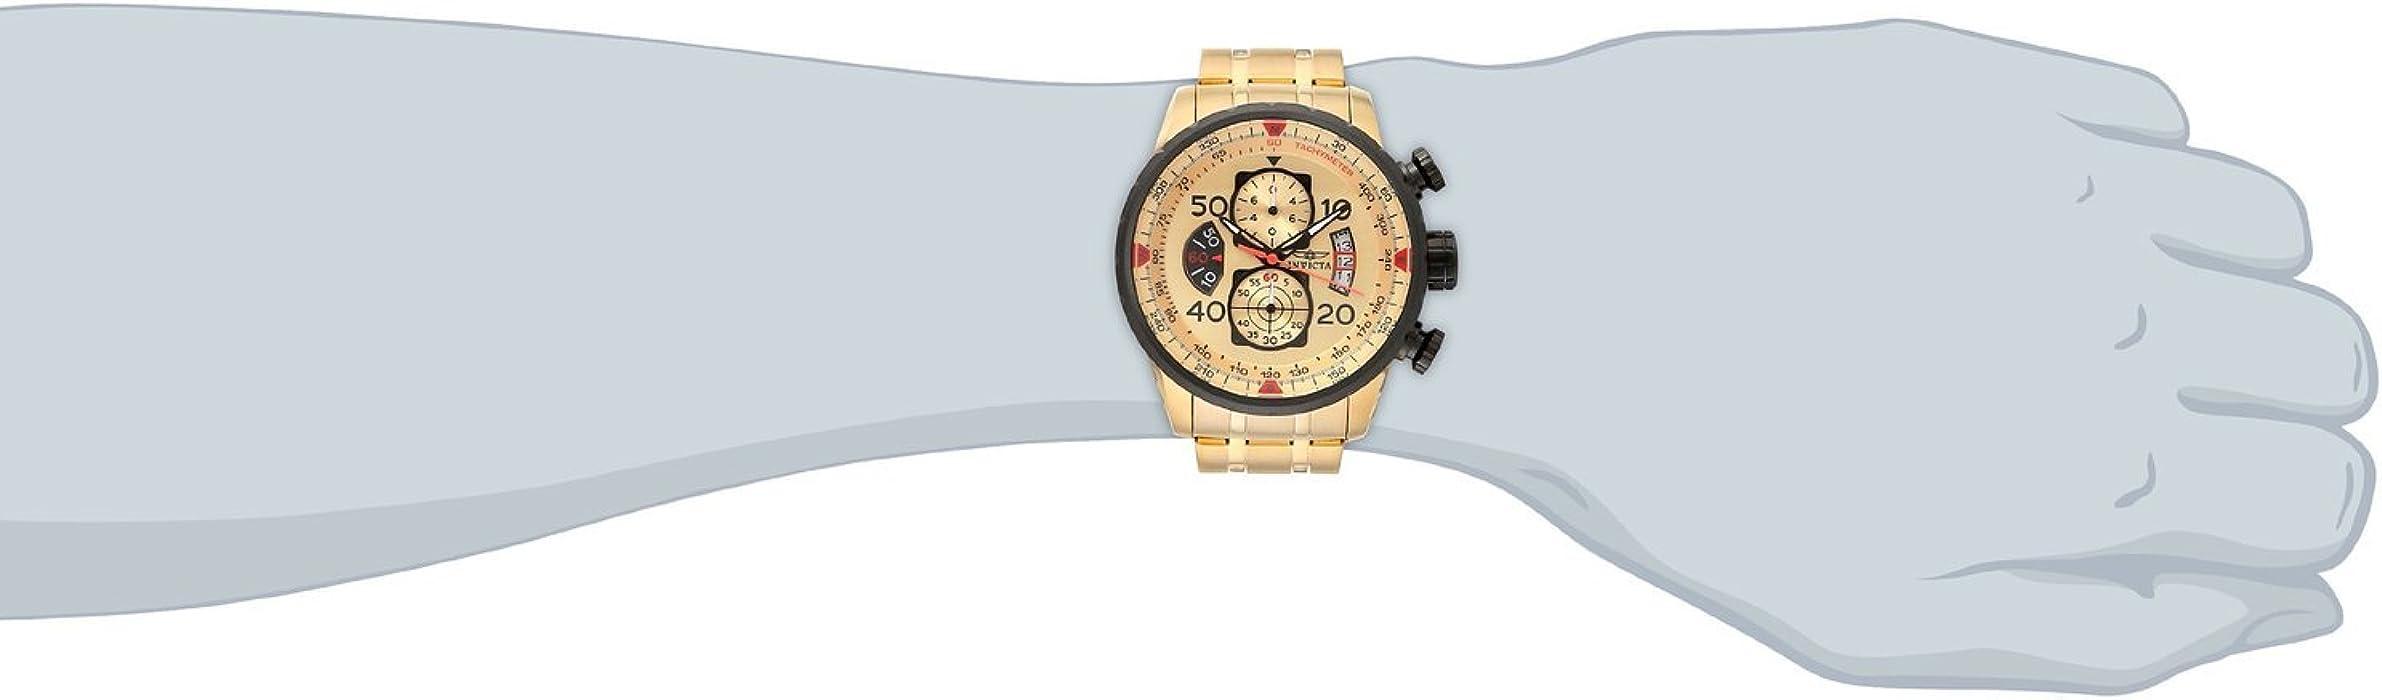 Invicta Men 17205 AVIATOR 18k Gold IonPlated Watch